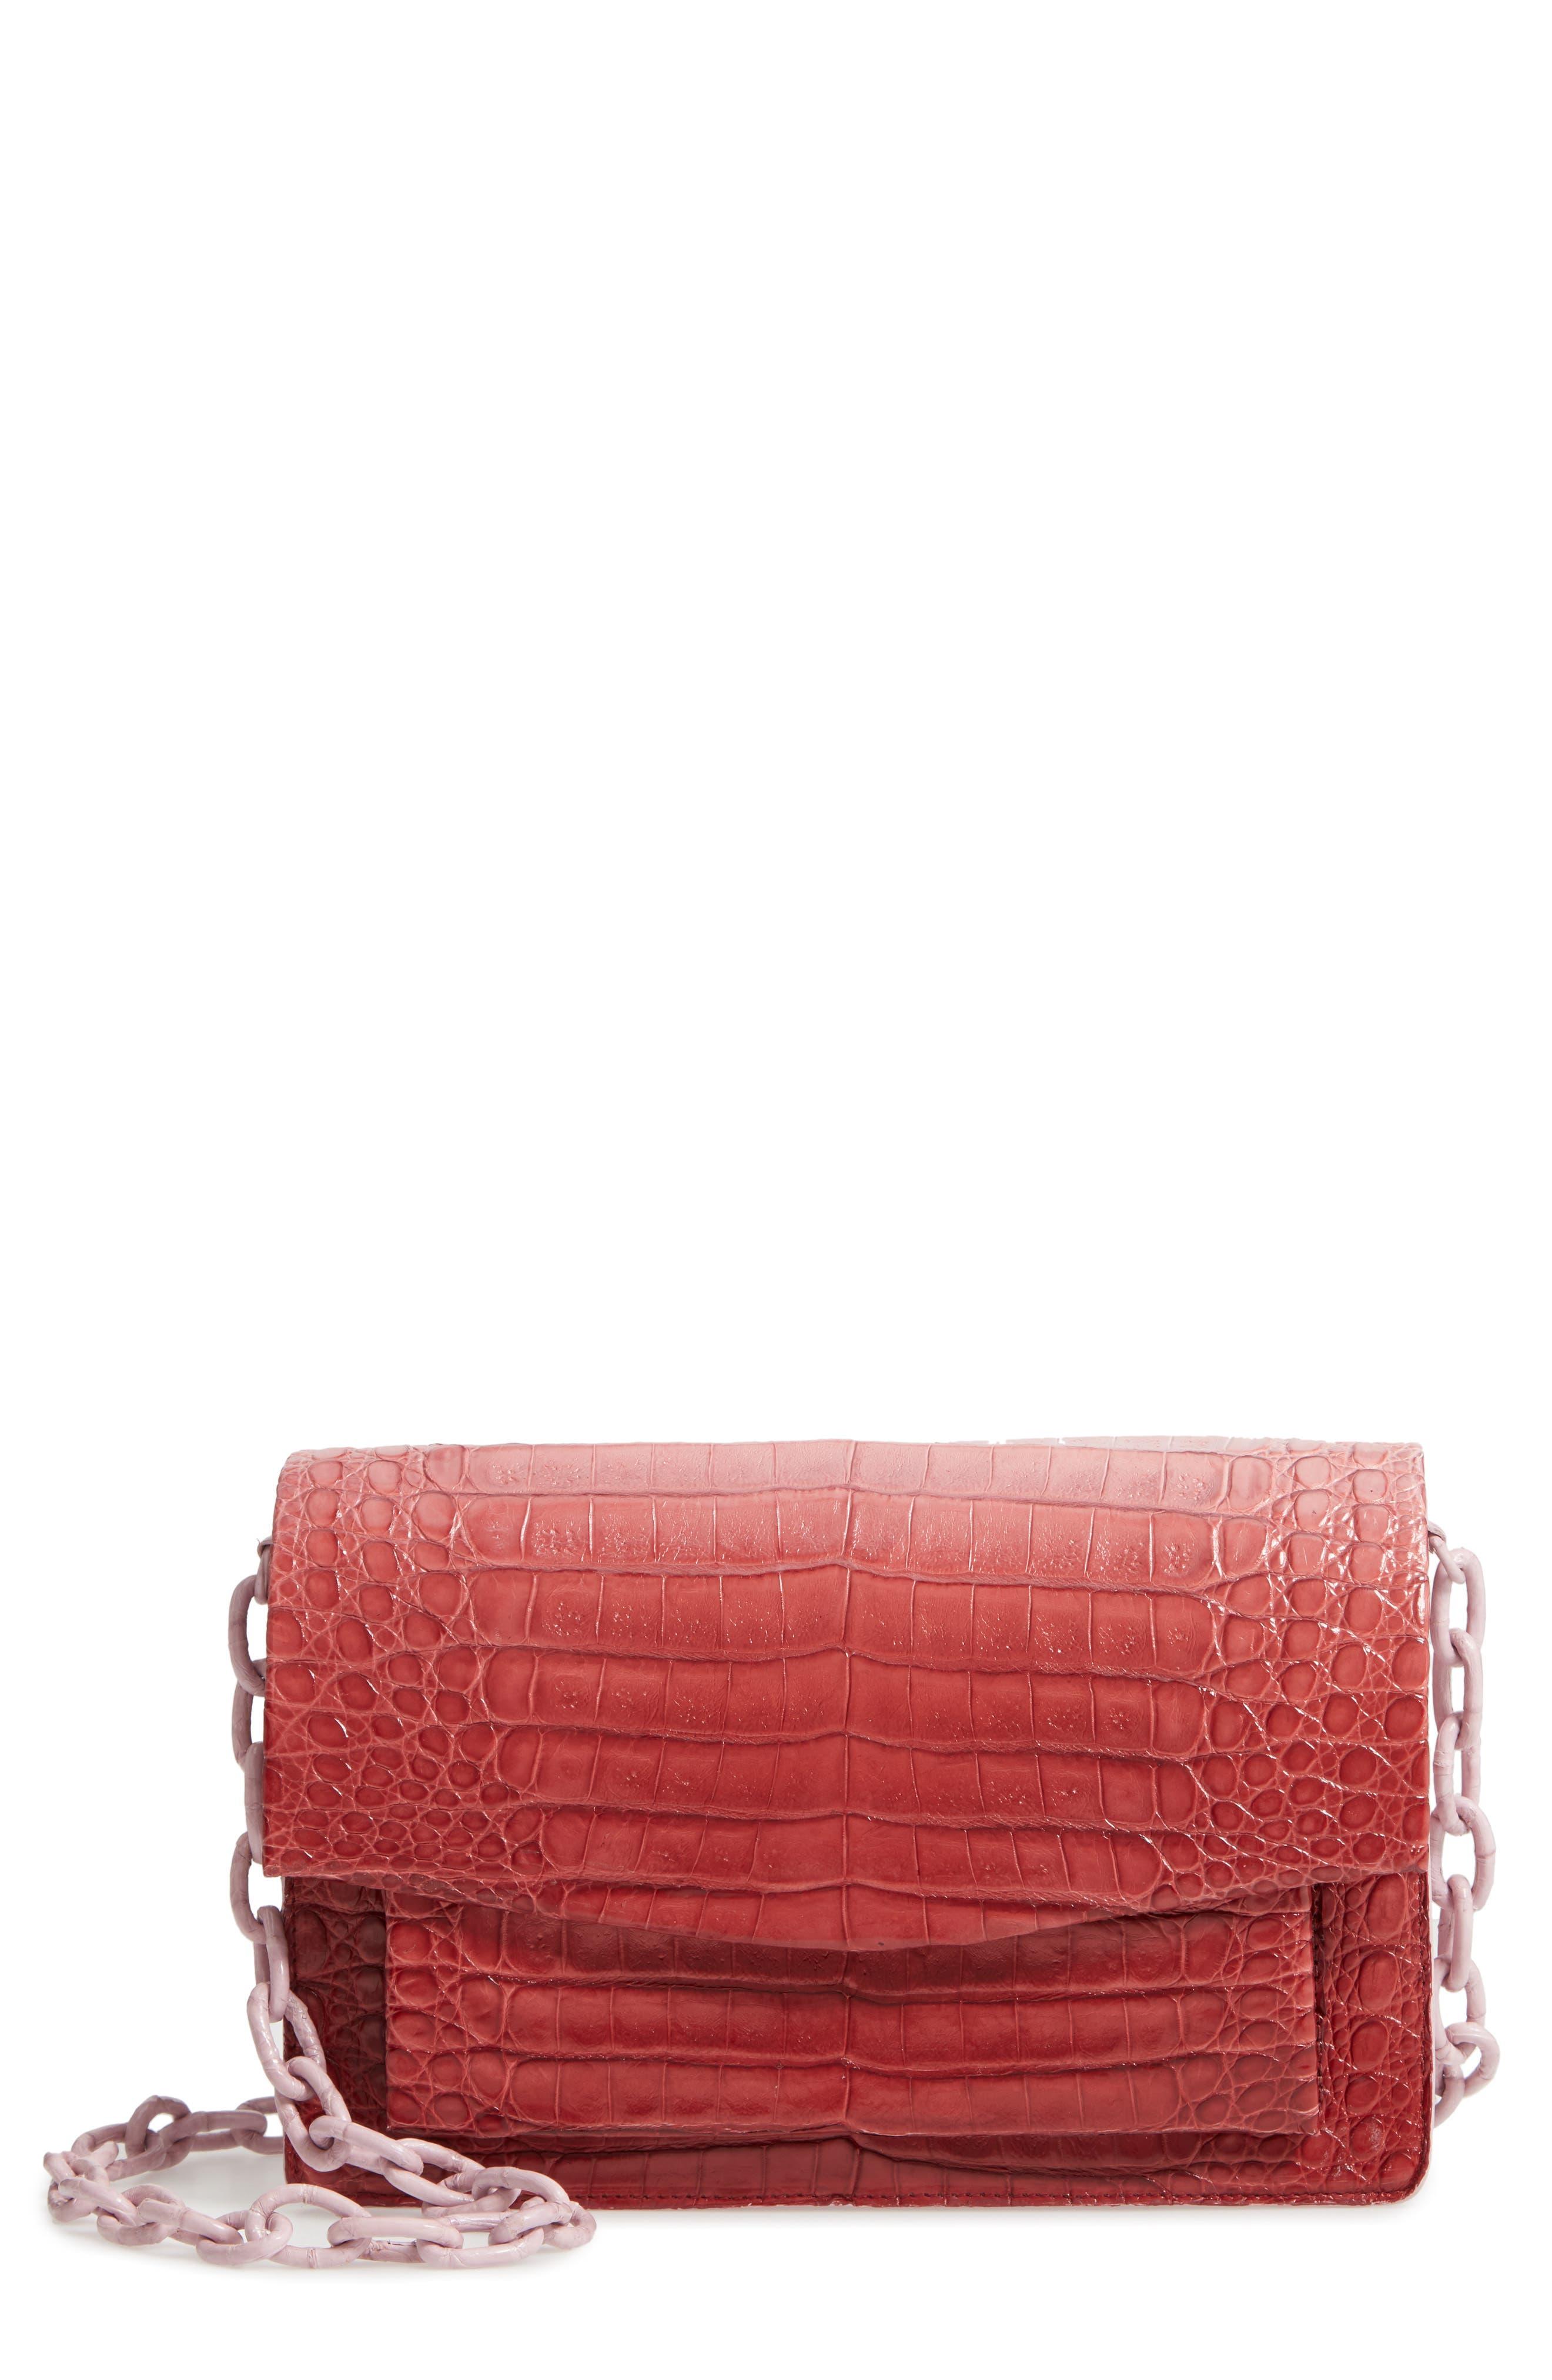 Medium Genuine Crocodile Crossbody Bag,                             Main thumbnail 1, color,                             550